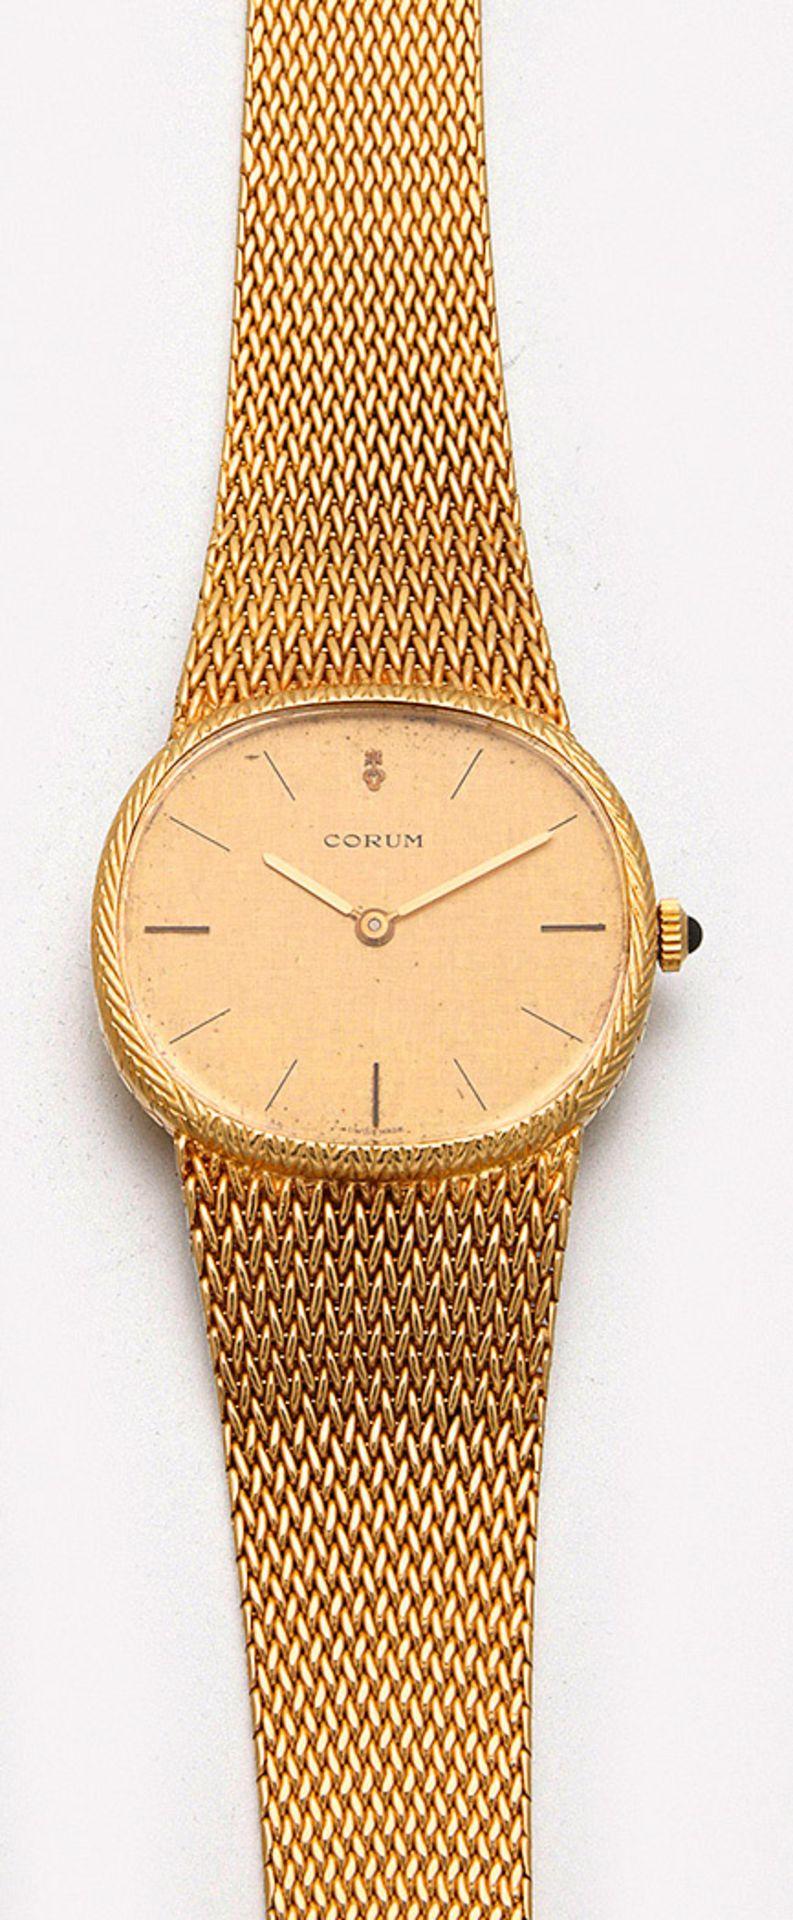 CORUM-Herrenarmbanduhr aus den 80er Jahren